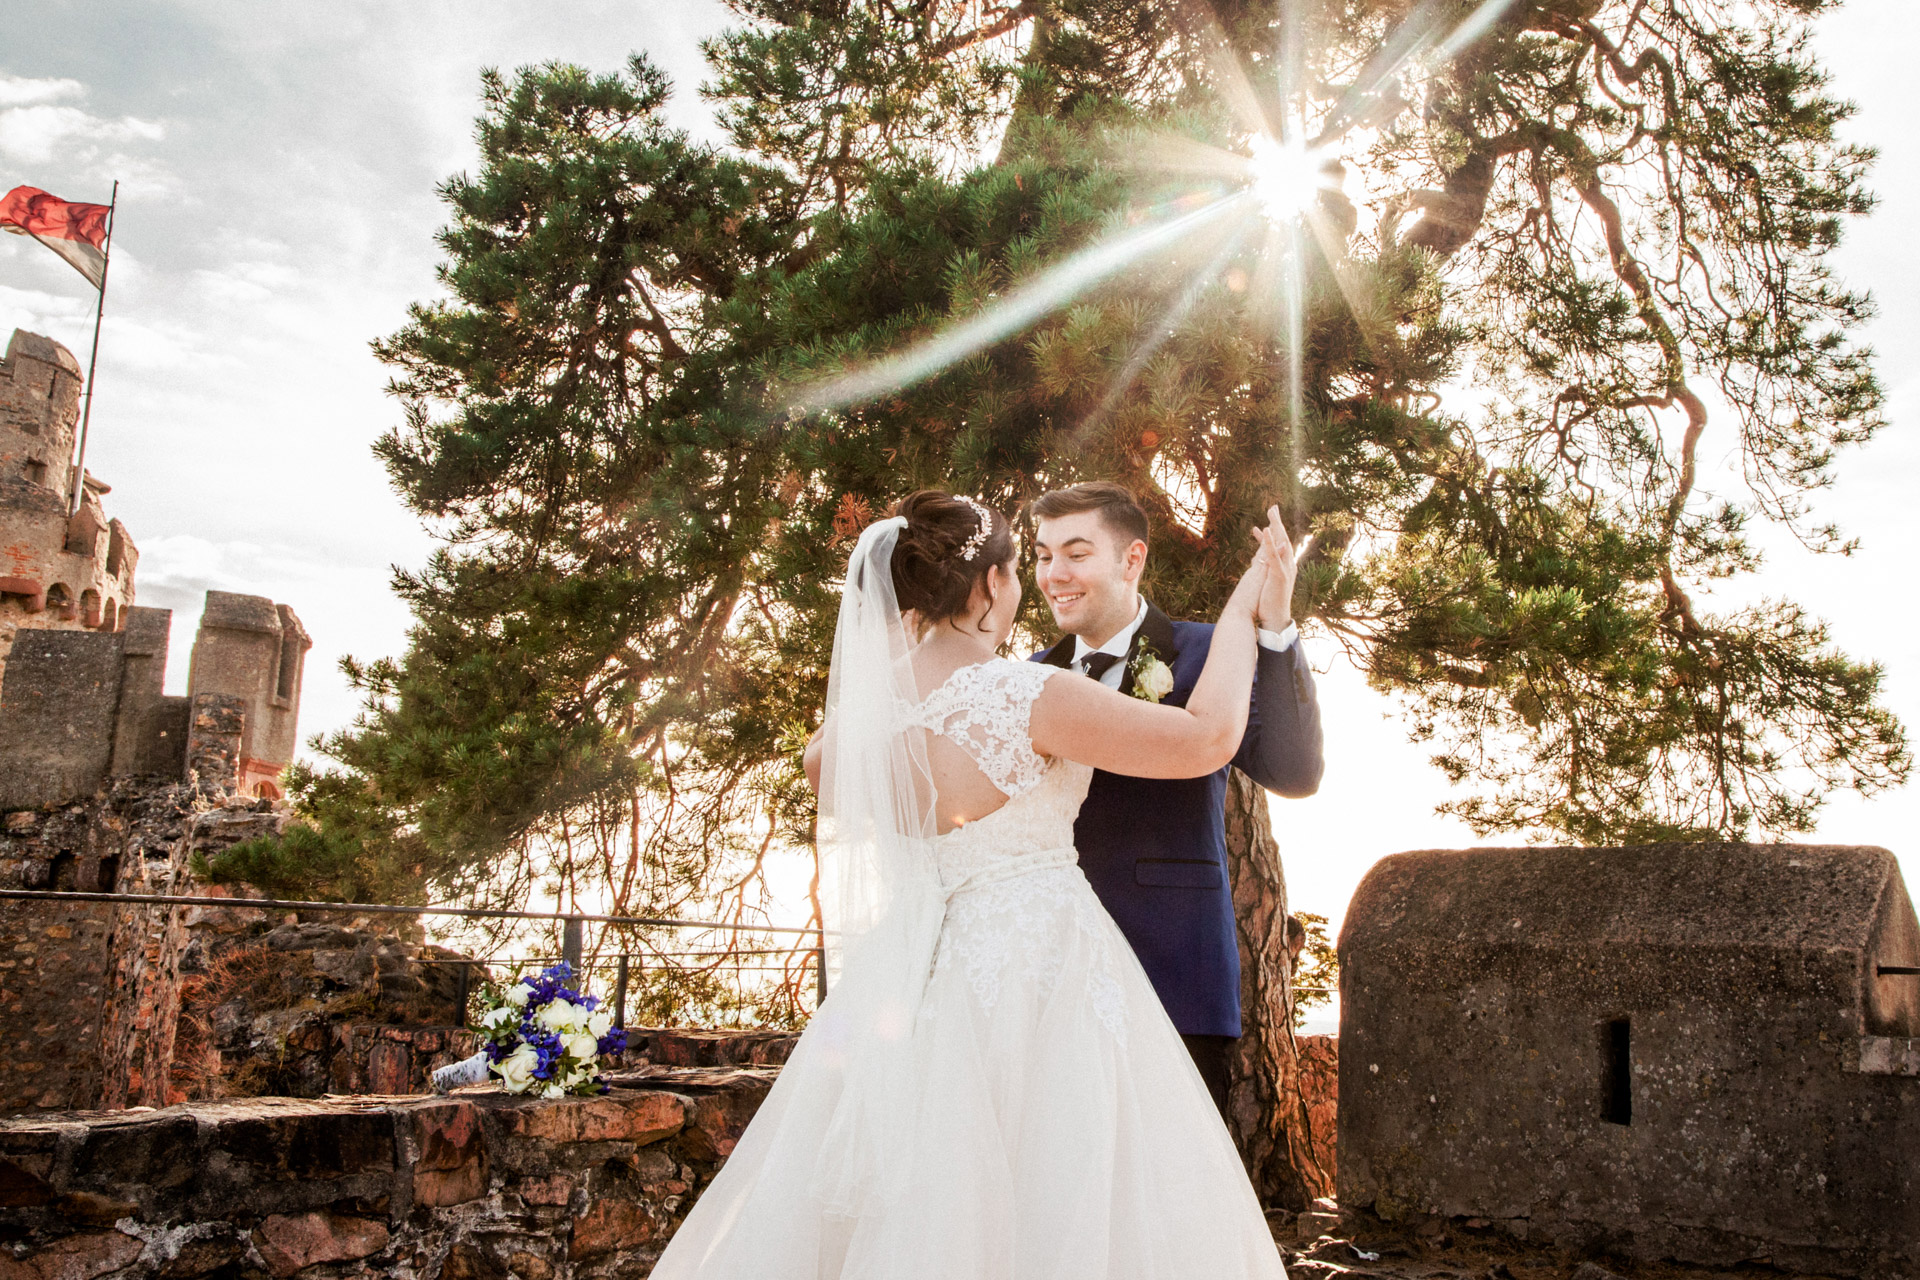 Hochzeitspaar, Auerbacher Schloss, Hochzeitsafotografie